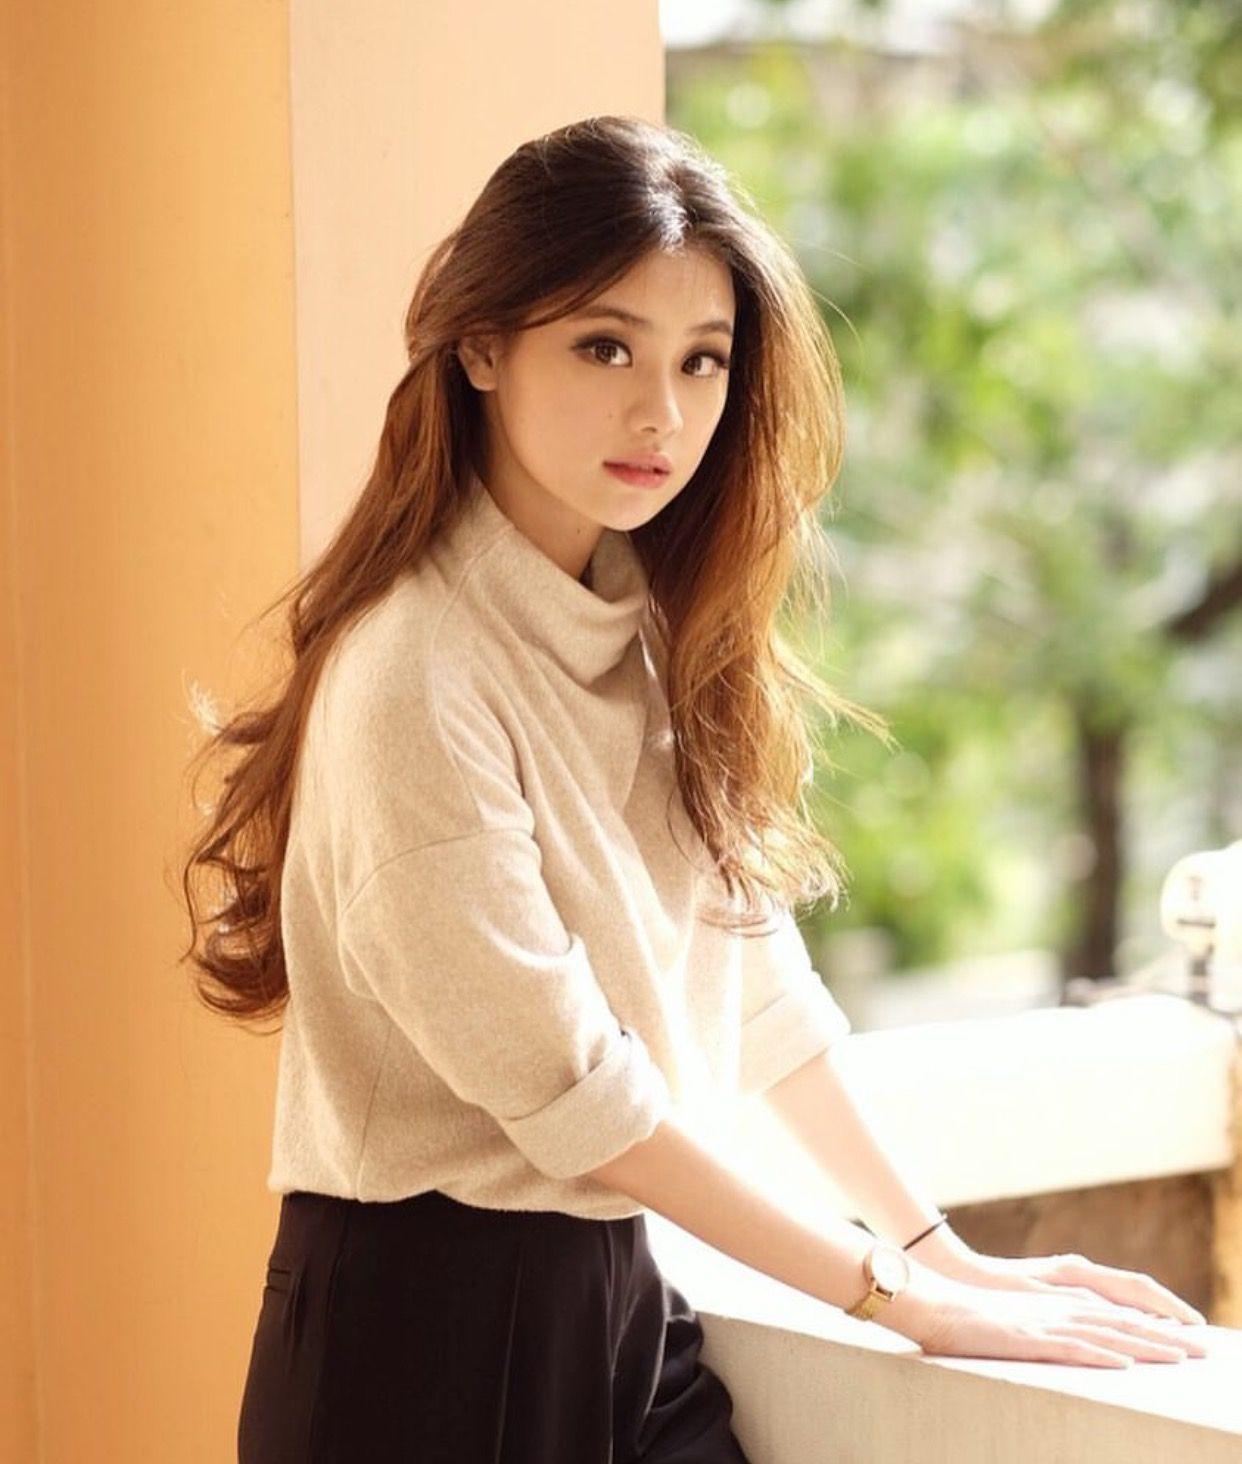 Pin oleh Shyyoung di Wjsn Naver Blog